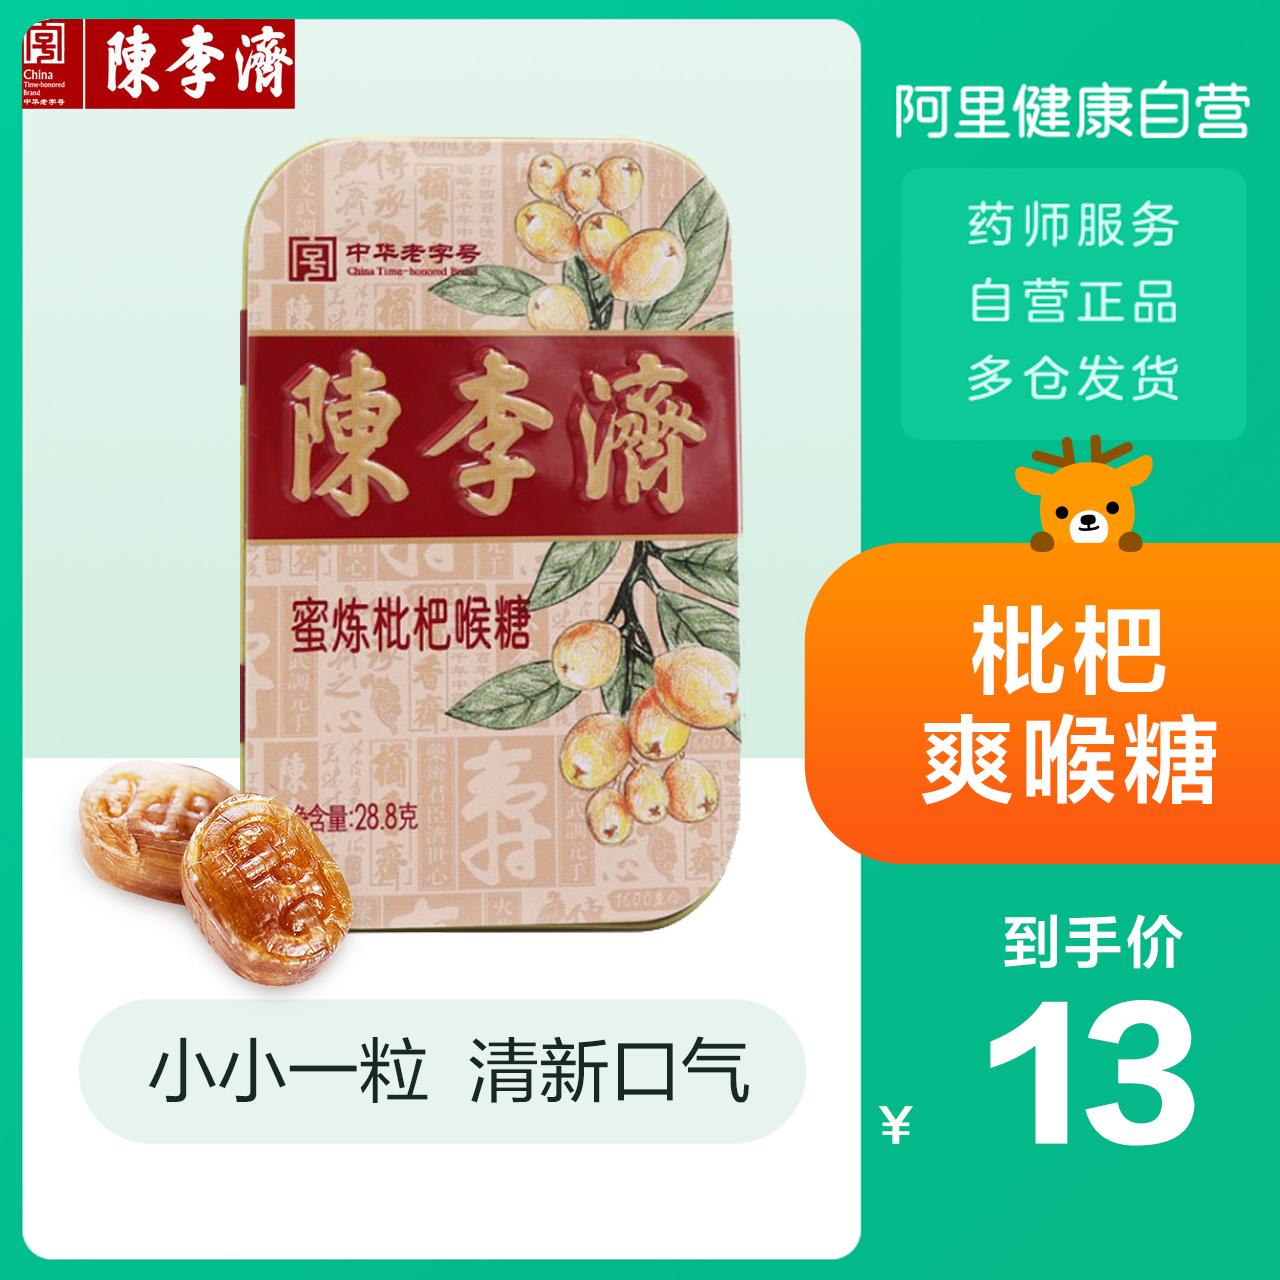 Chen Li Ji throat molasses refined loquat sugar snacks candy throat tablets fresh breath lozenges hard candy iron box